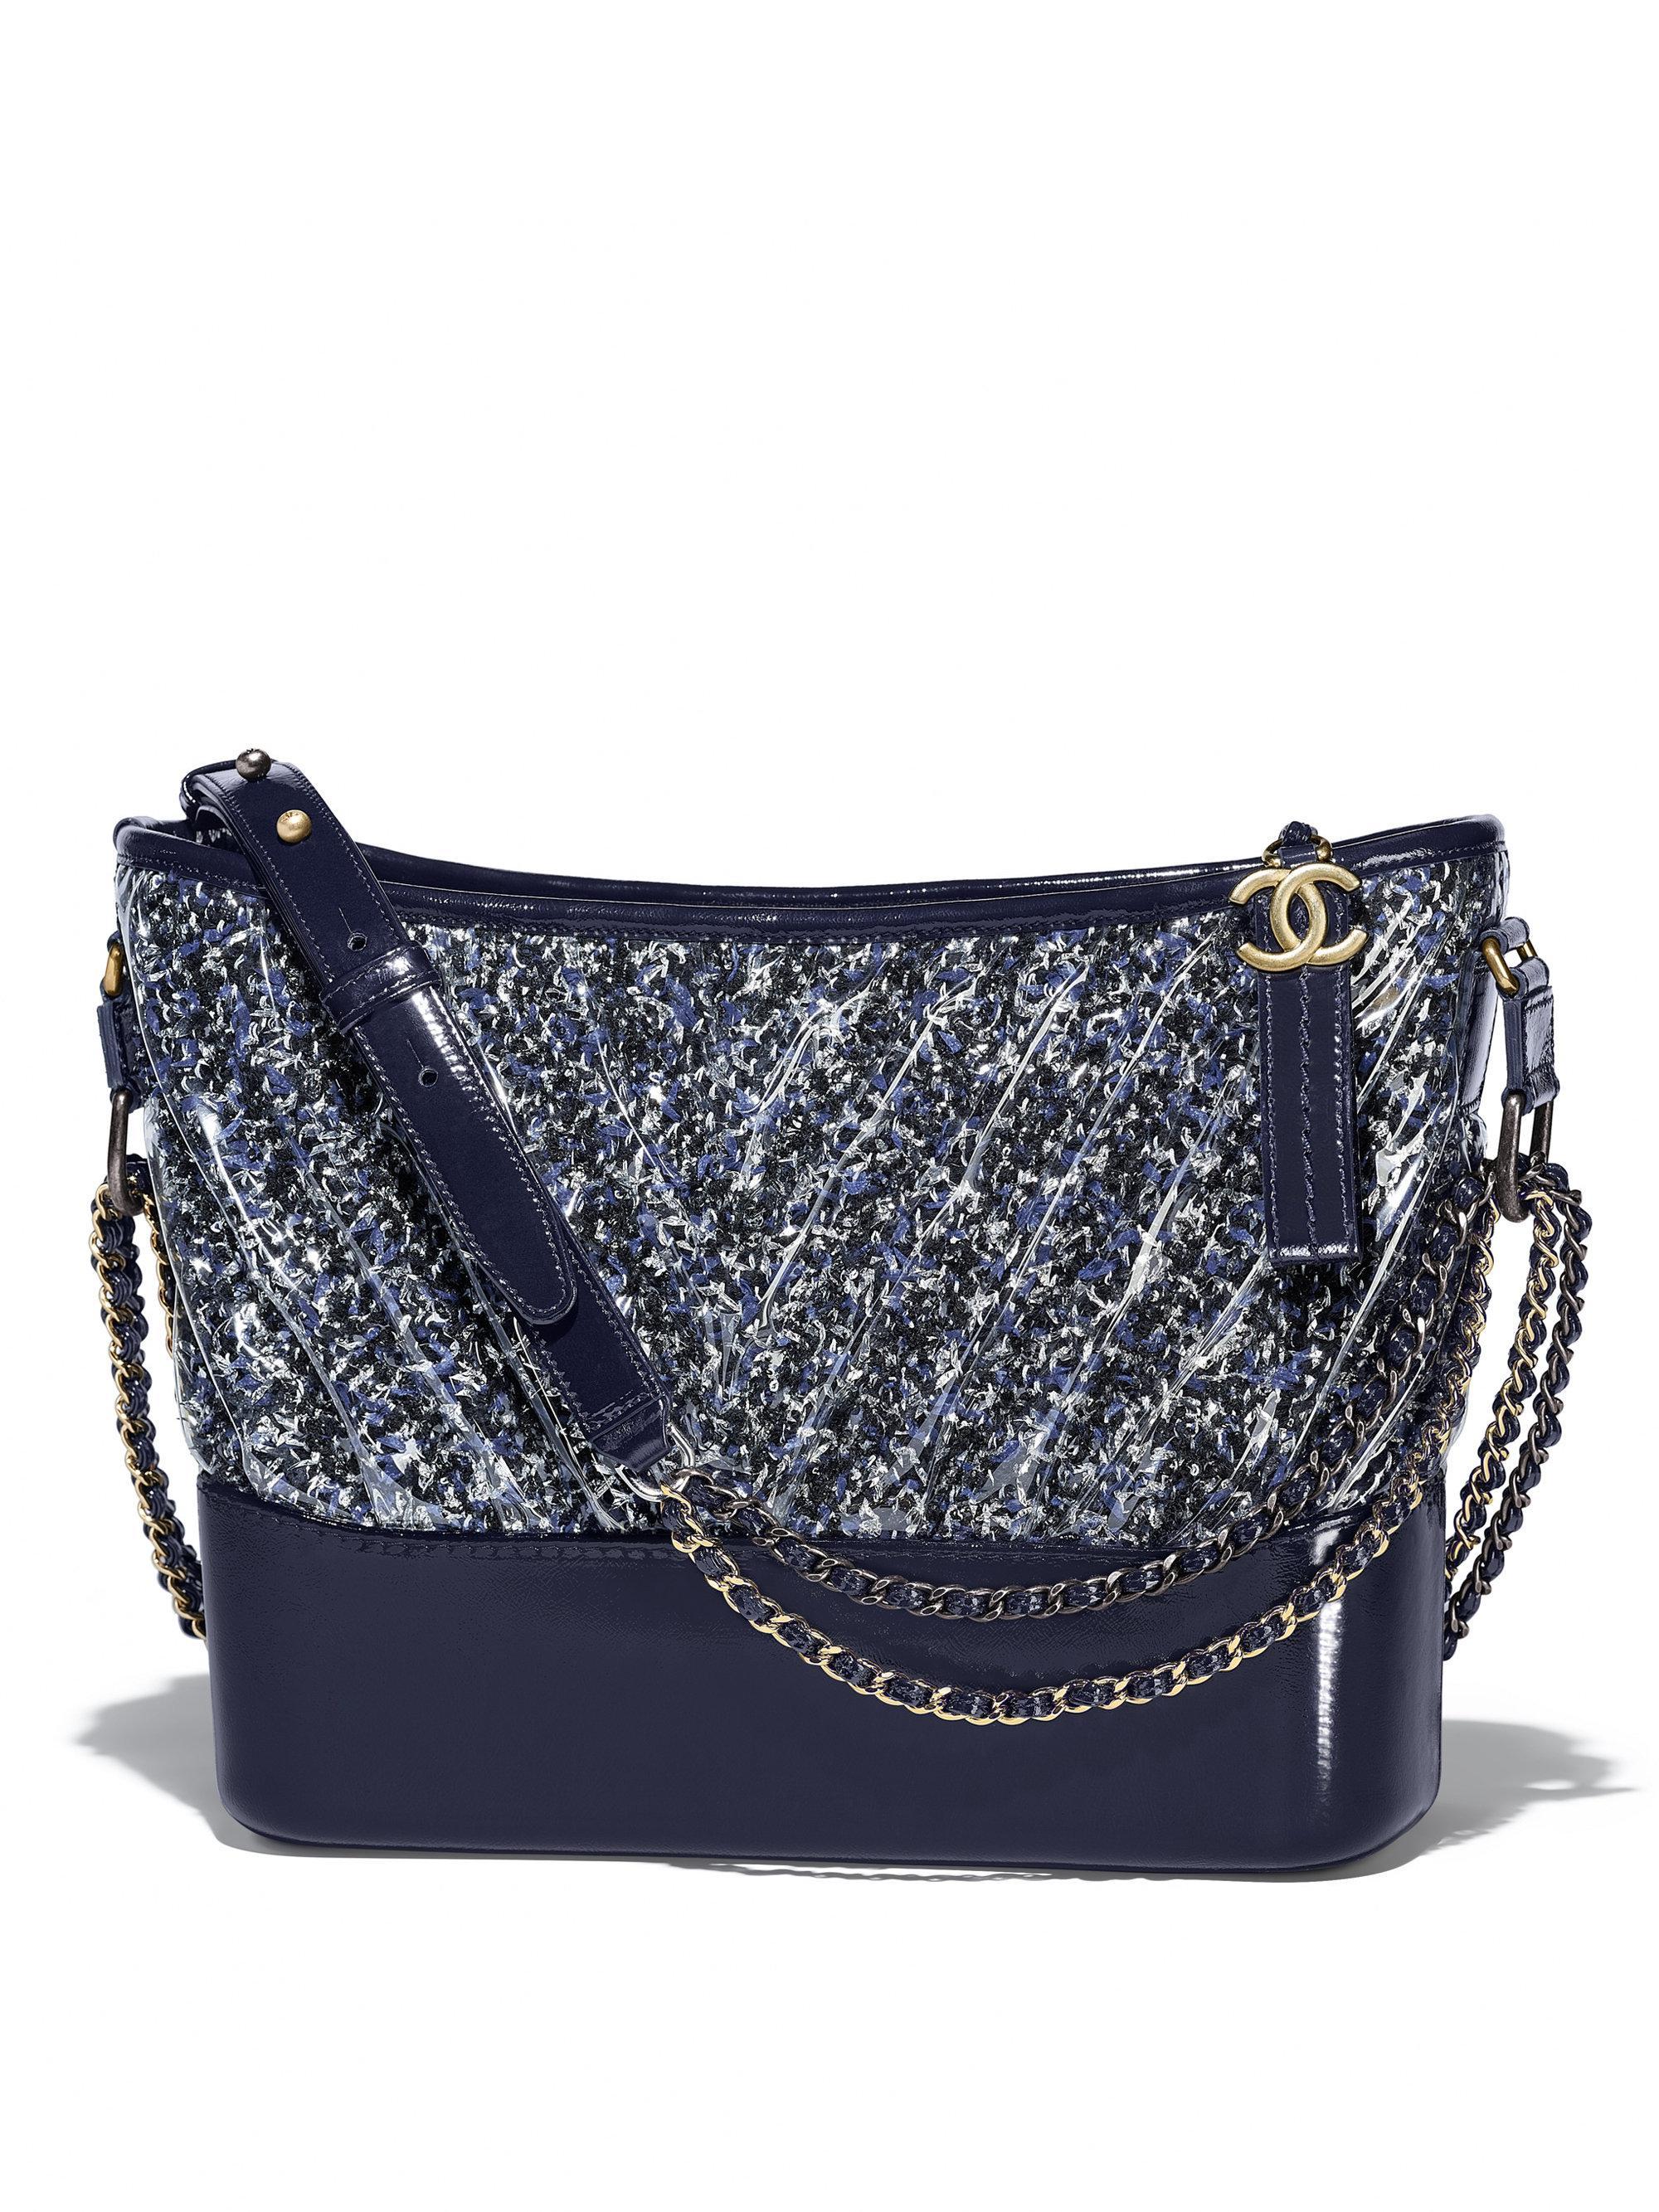 6ad4d53cde Chanel Blue 's Gabrielle Hobo Bag